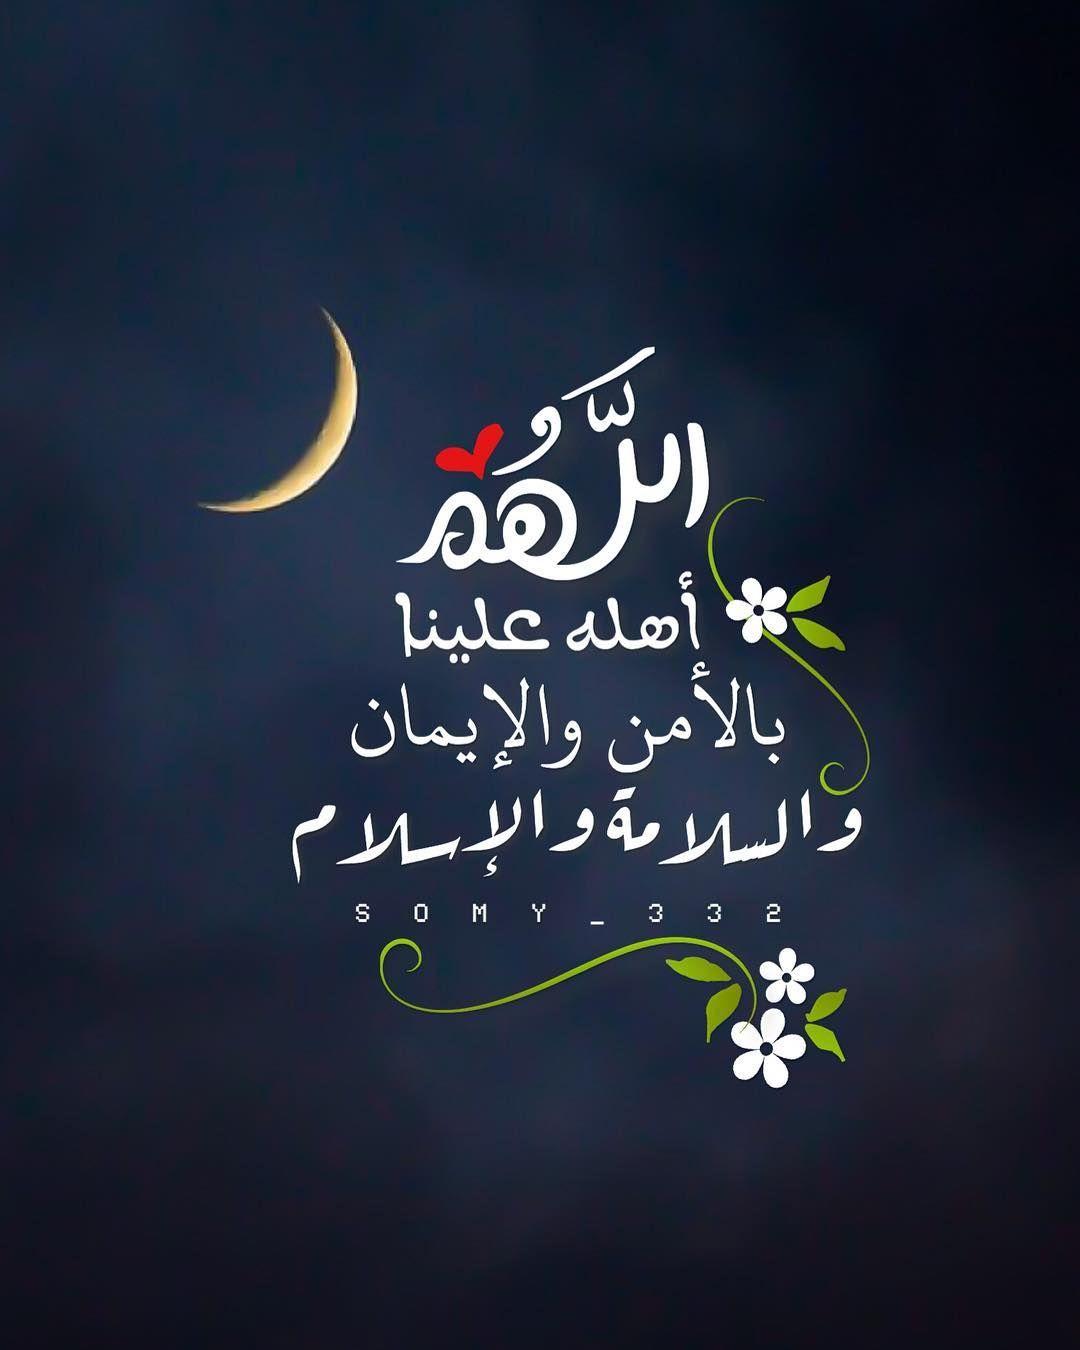 Pin By Rsho Alrasha On رمضان مبارك Islam Ramadan Ramadan Kareem Ramadan